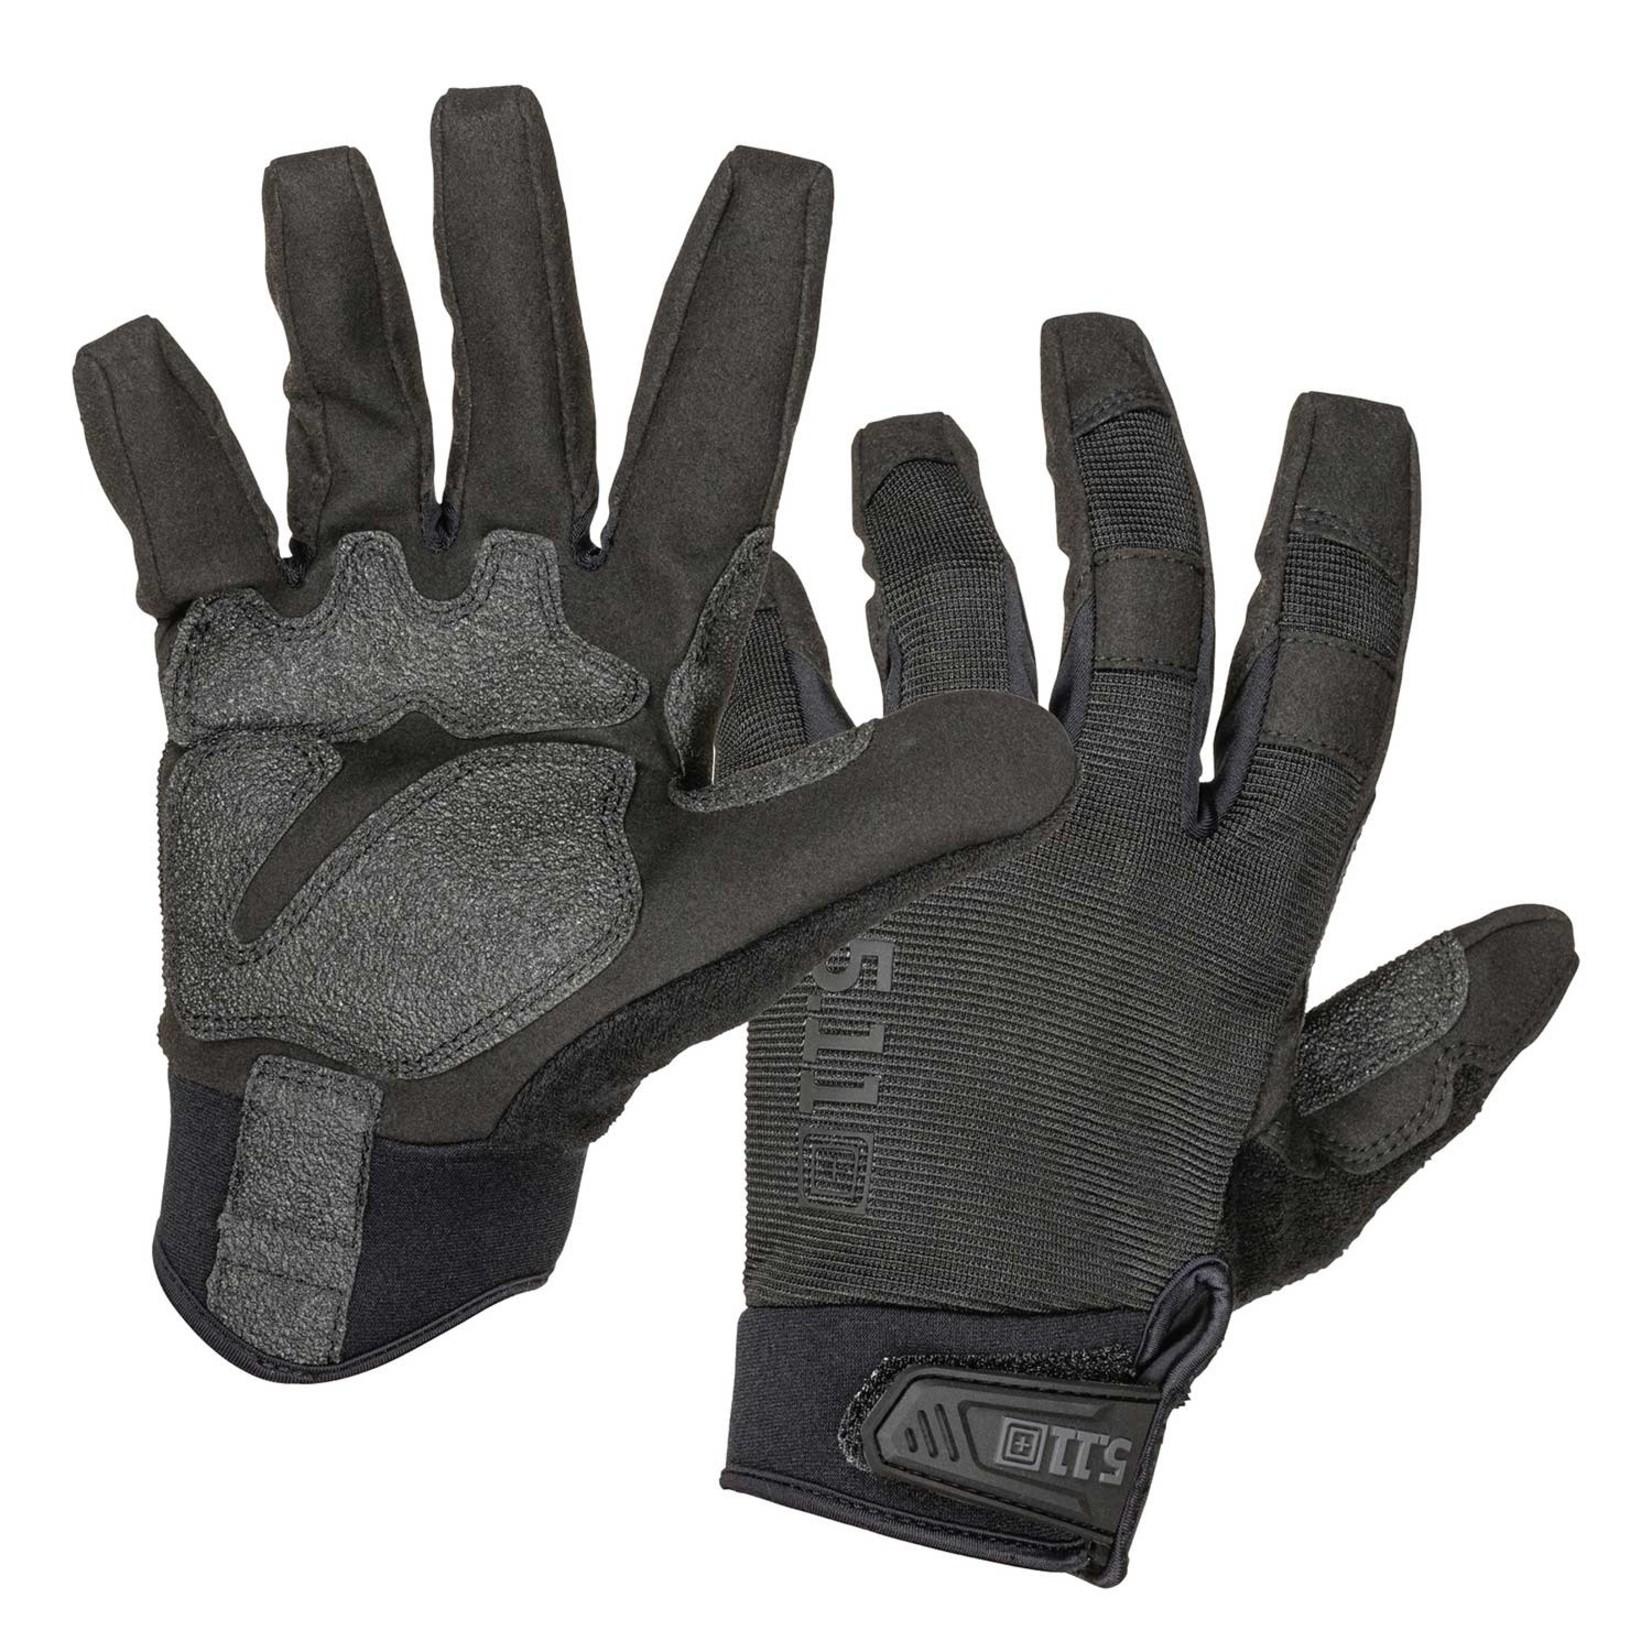 5.11 Tactical 5.11 Tac A3 Glove